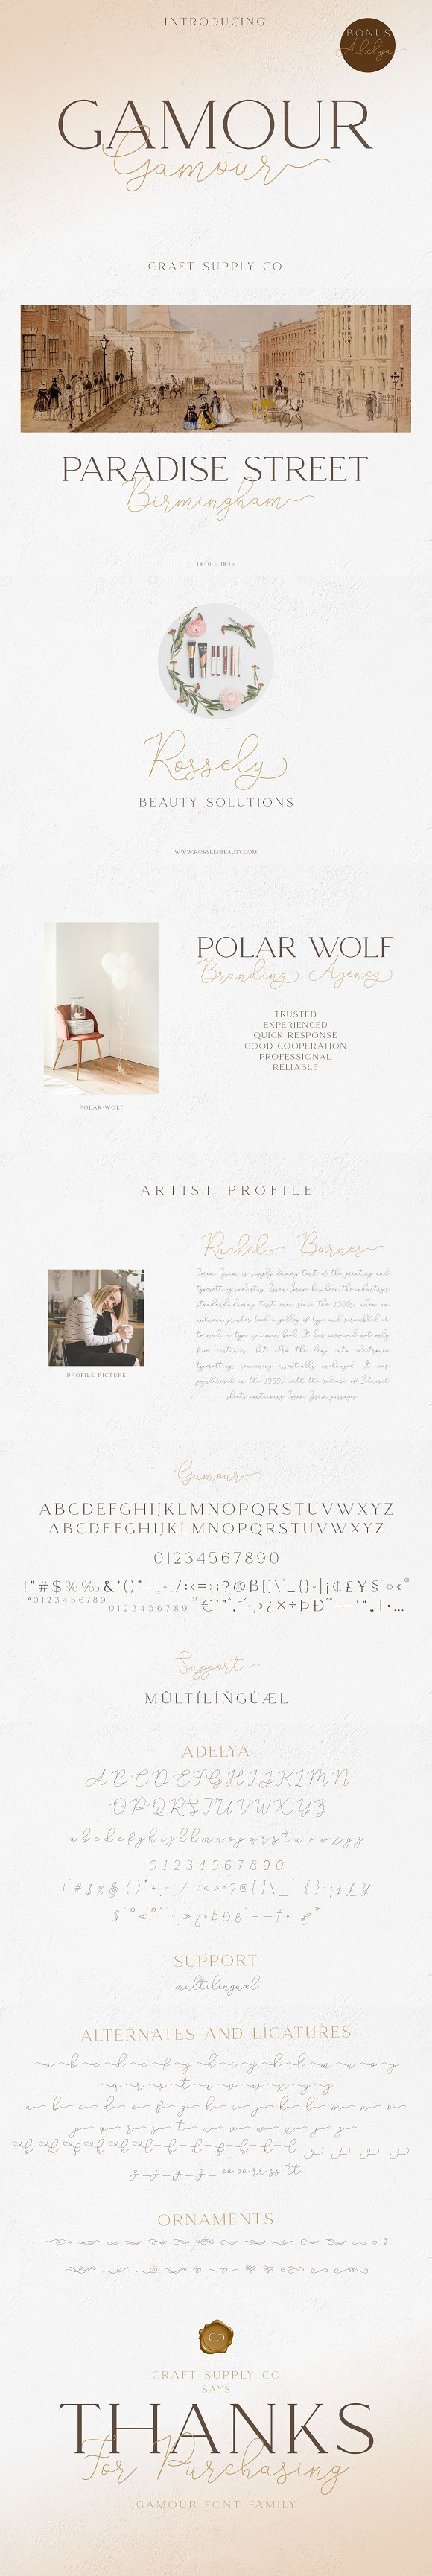 Gamour - Elegant Serif Font + Bonus in Serif Fonts - product preview 9